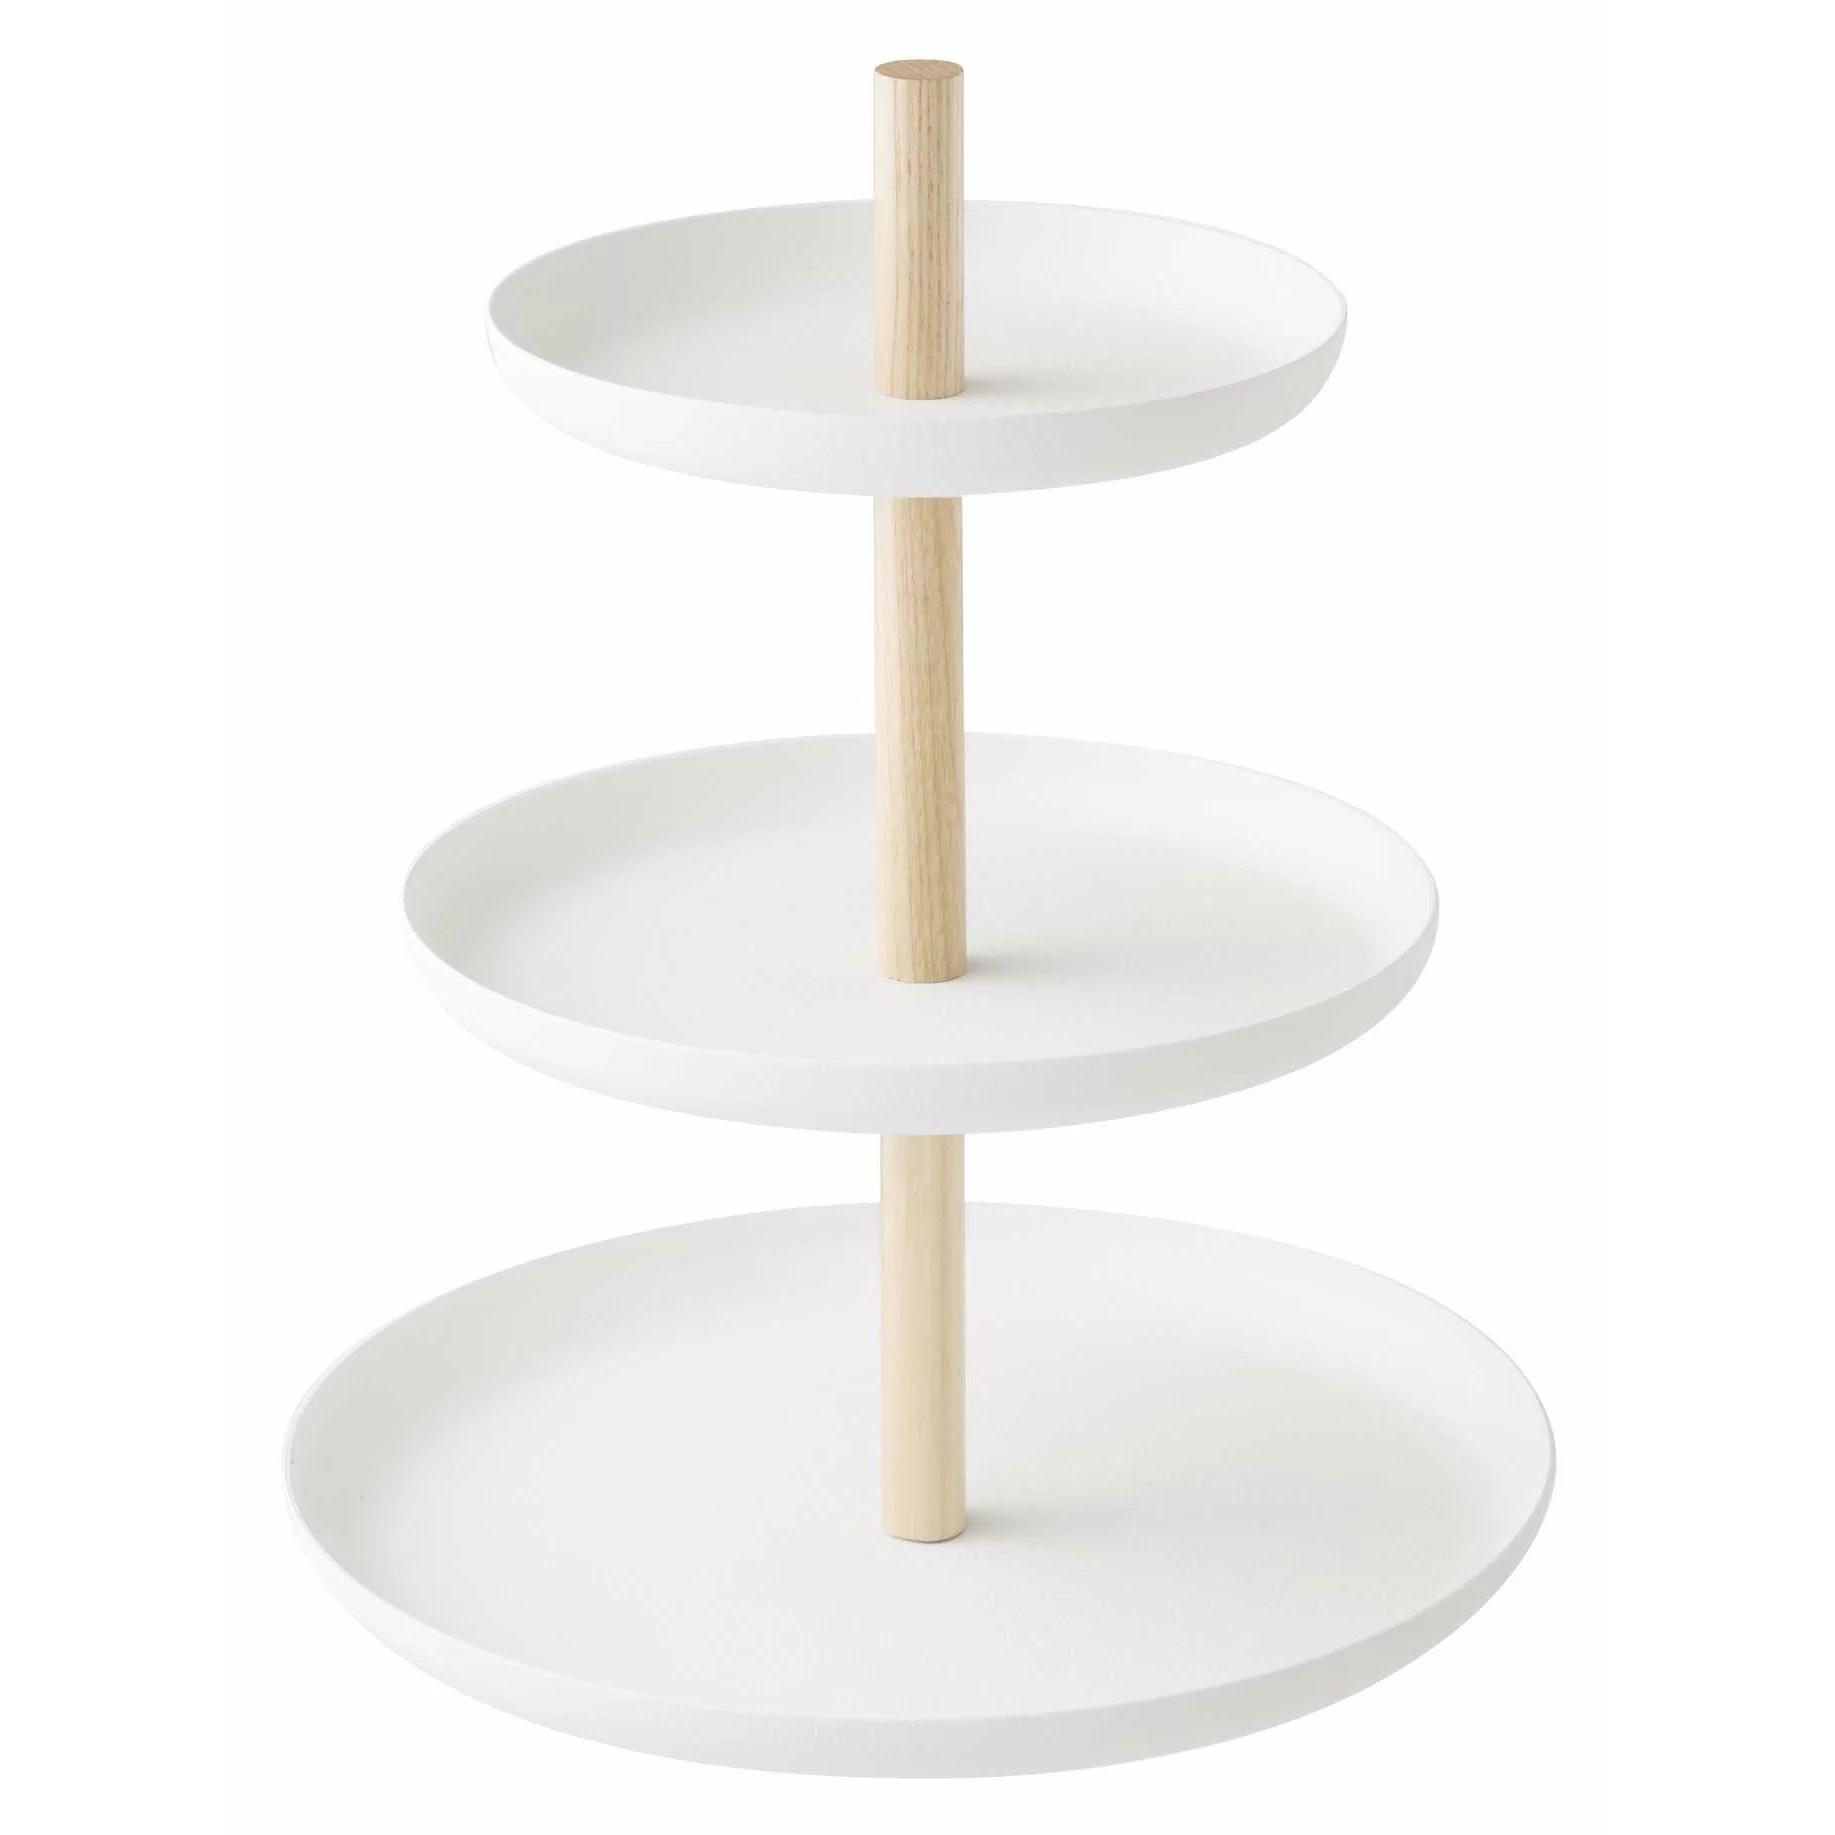 Yamazaki USA Tosca 3 Tiered Cake Stand Amp Reviews Wayfair